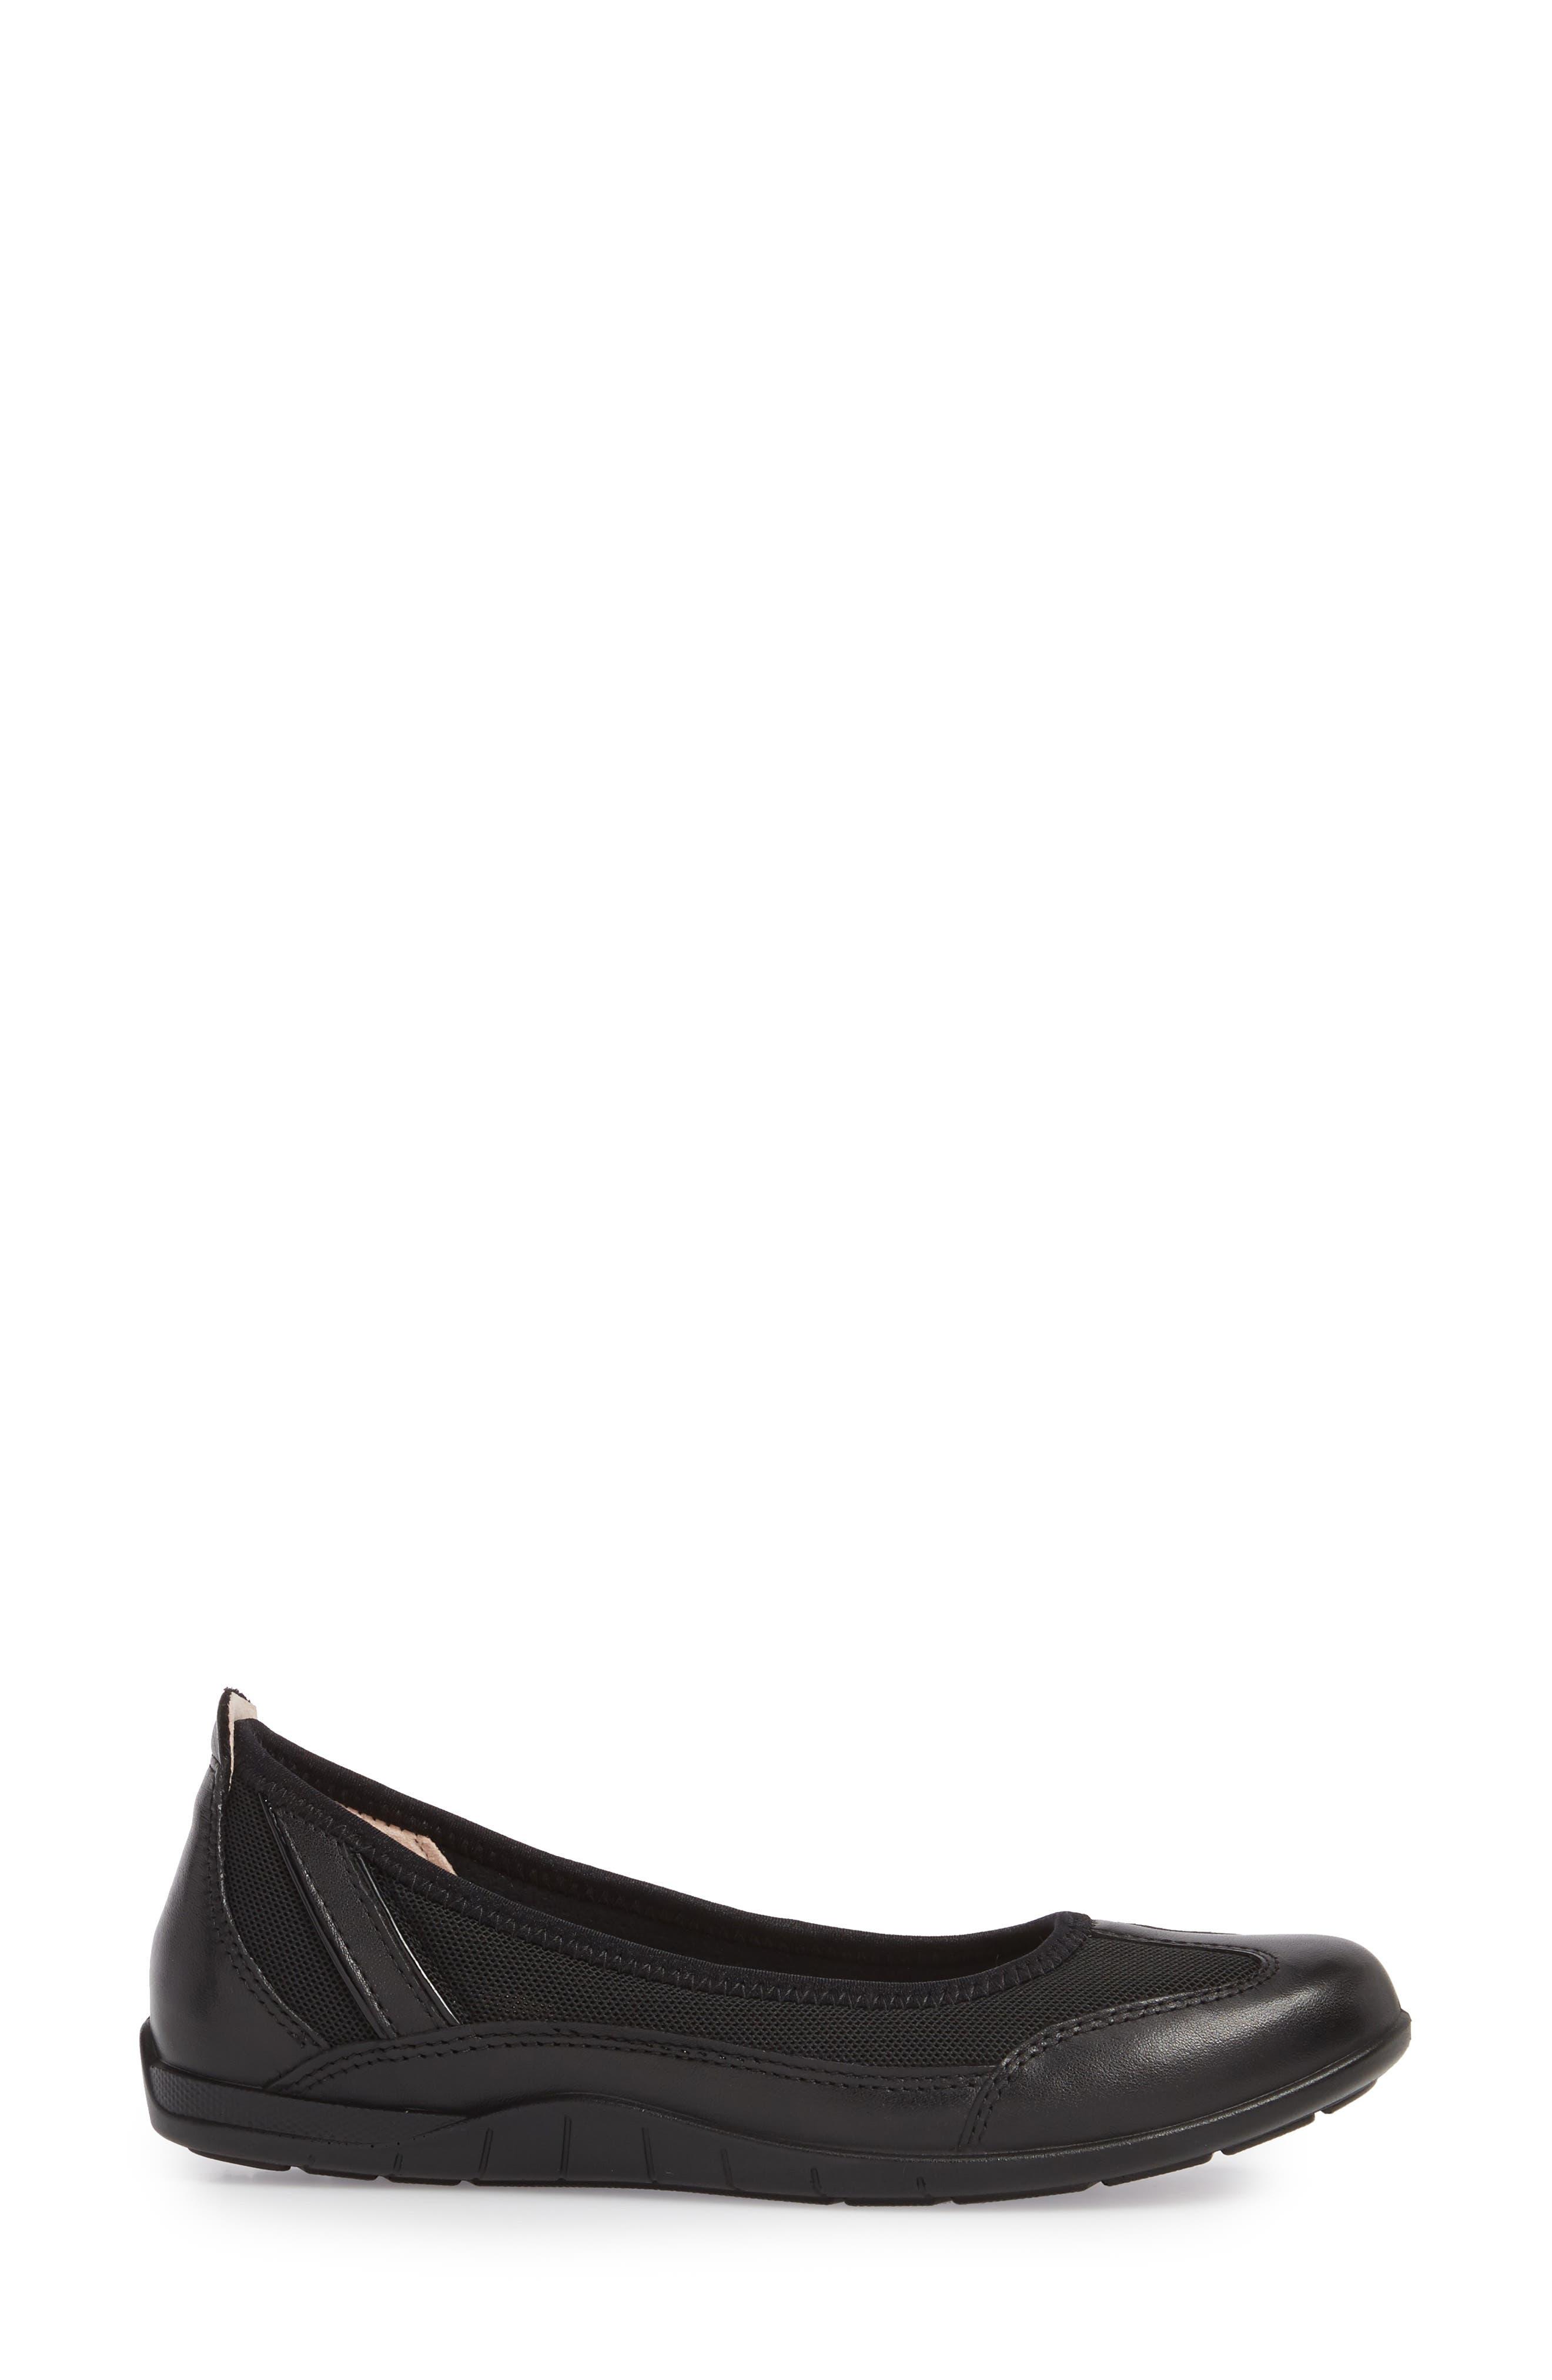 ECCO, 'Bluma' Ballet Sneaker, Alternate thumbnail 3, color, BLACK LEATHER